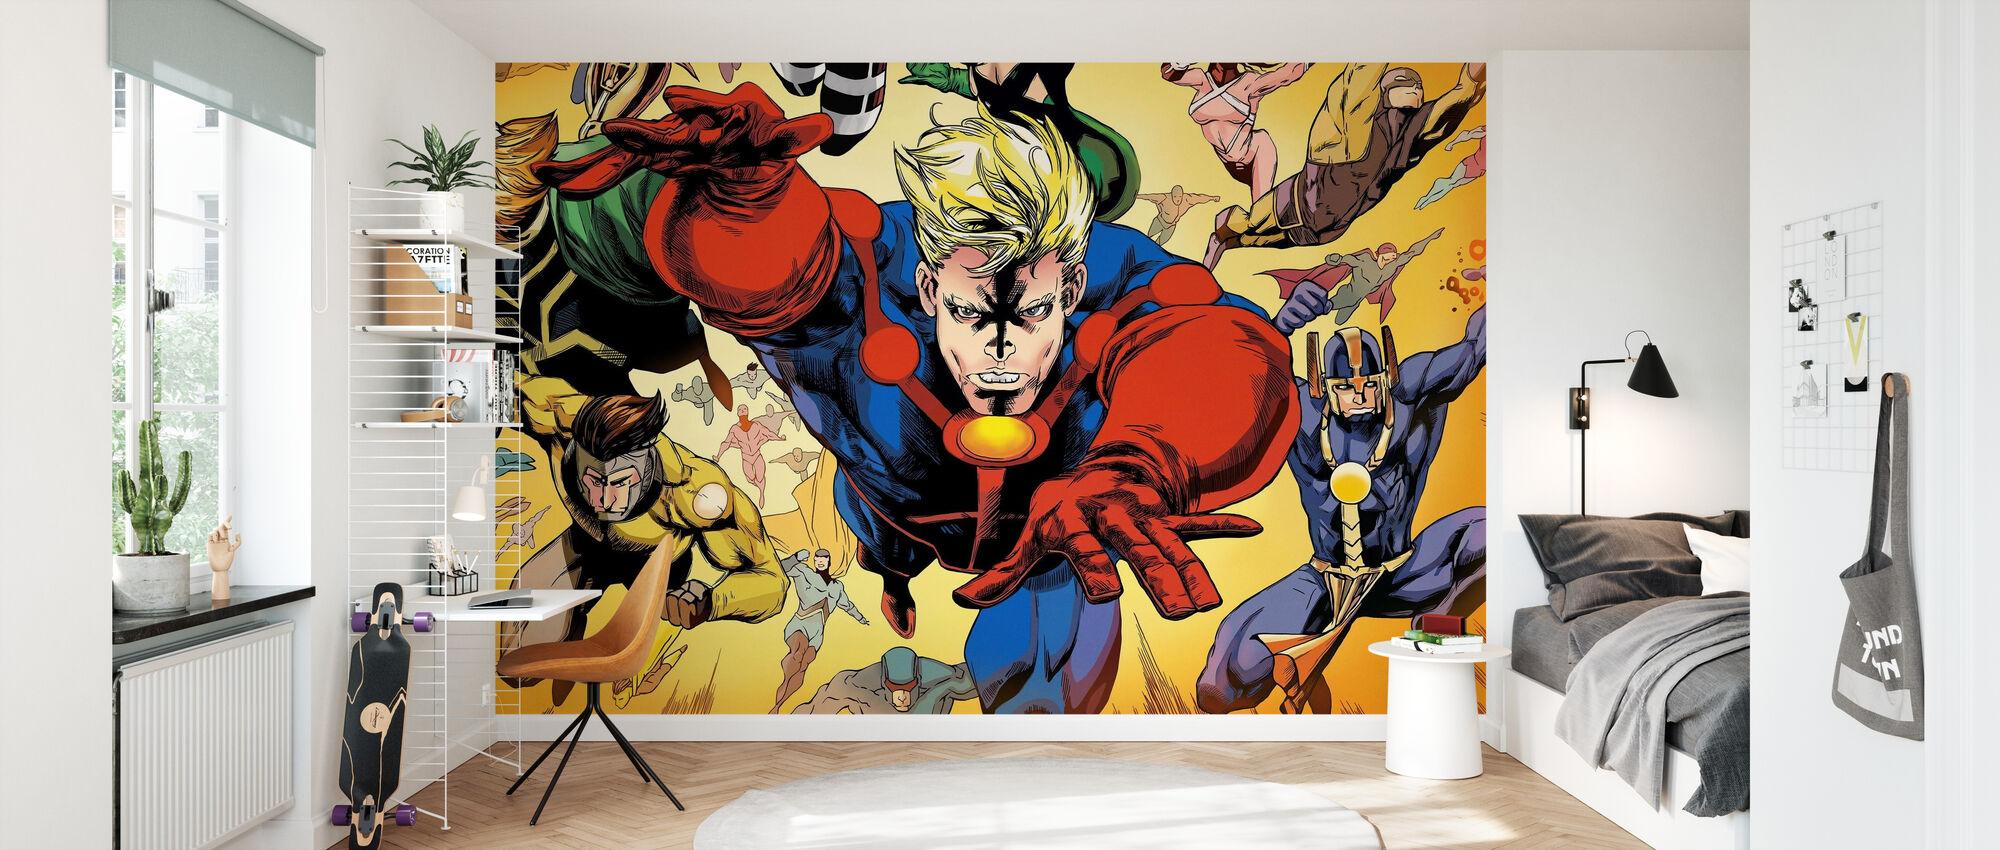 Superheros - Wallpaper - Kids Room